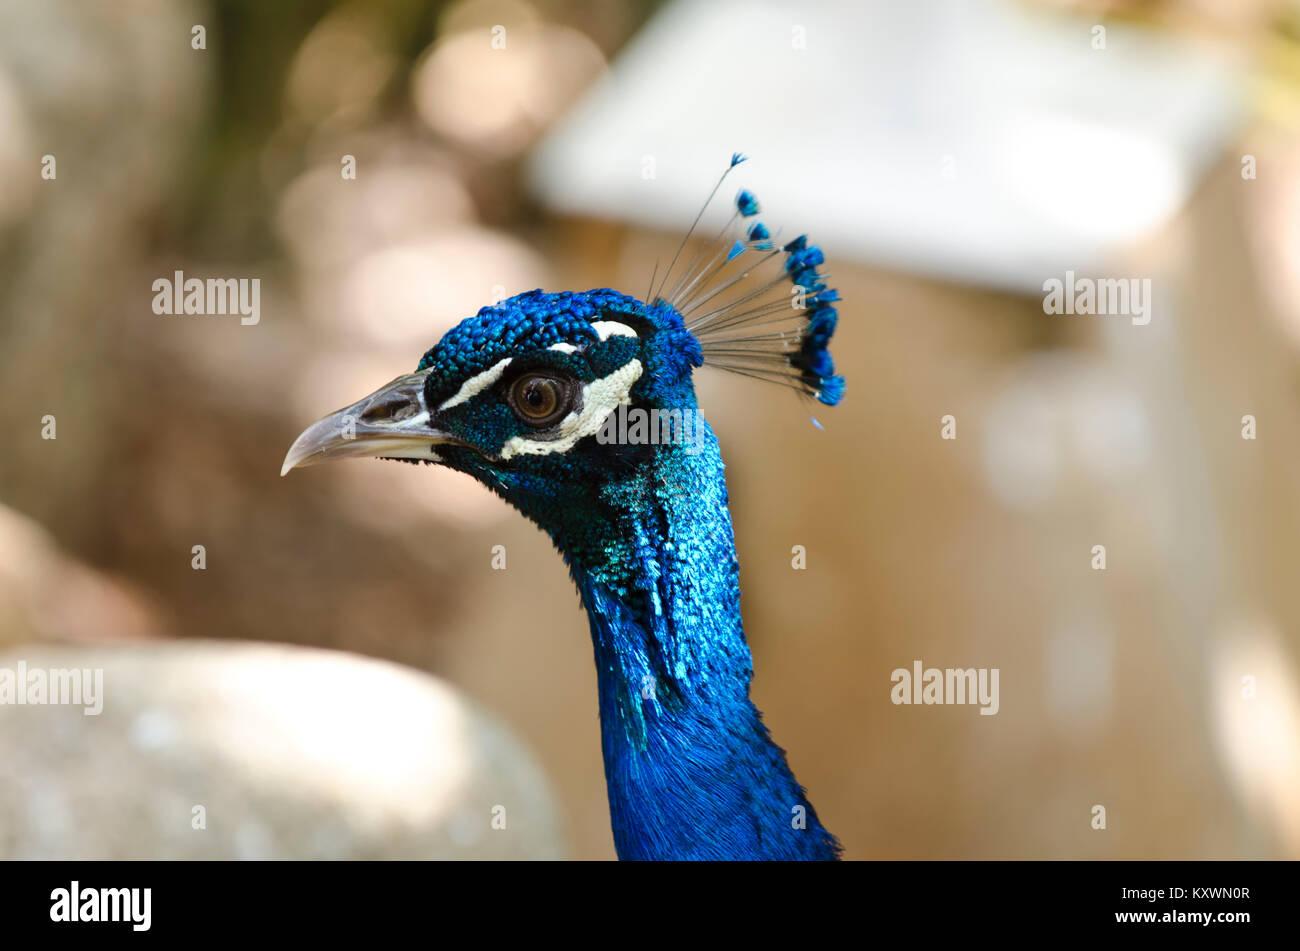 Peacock head portrait. Close-up Stock Photo